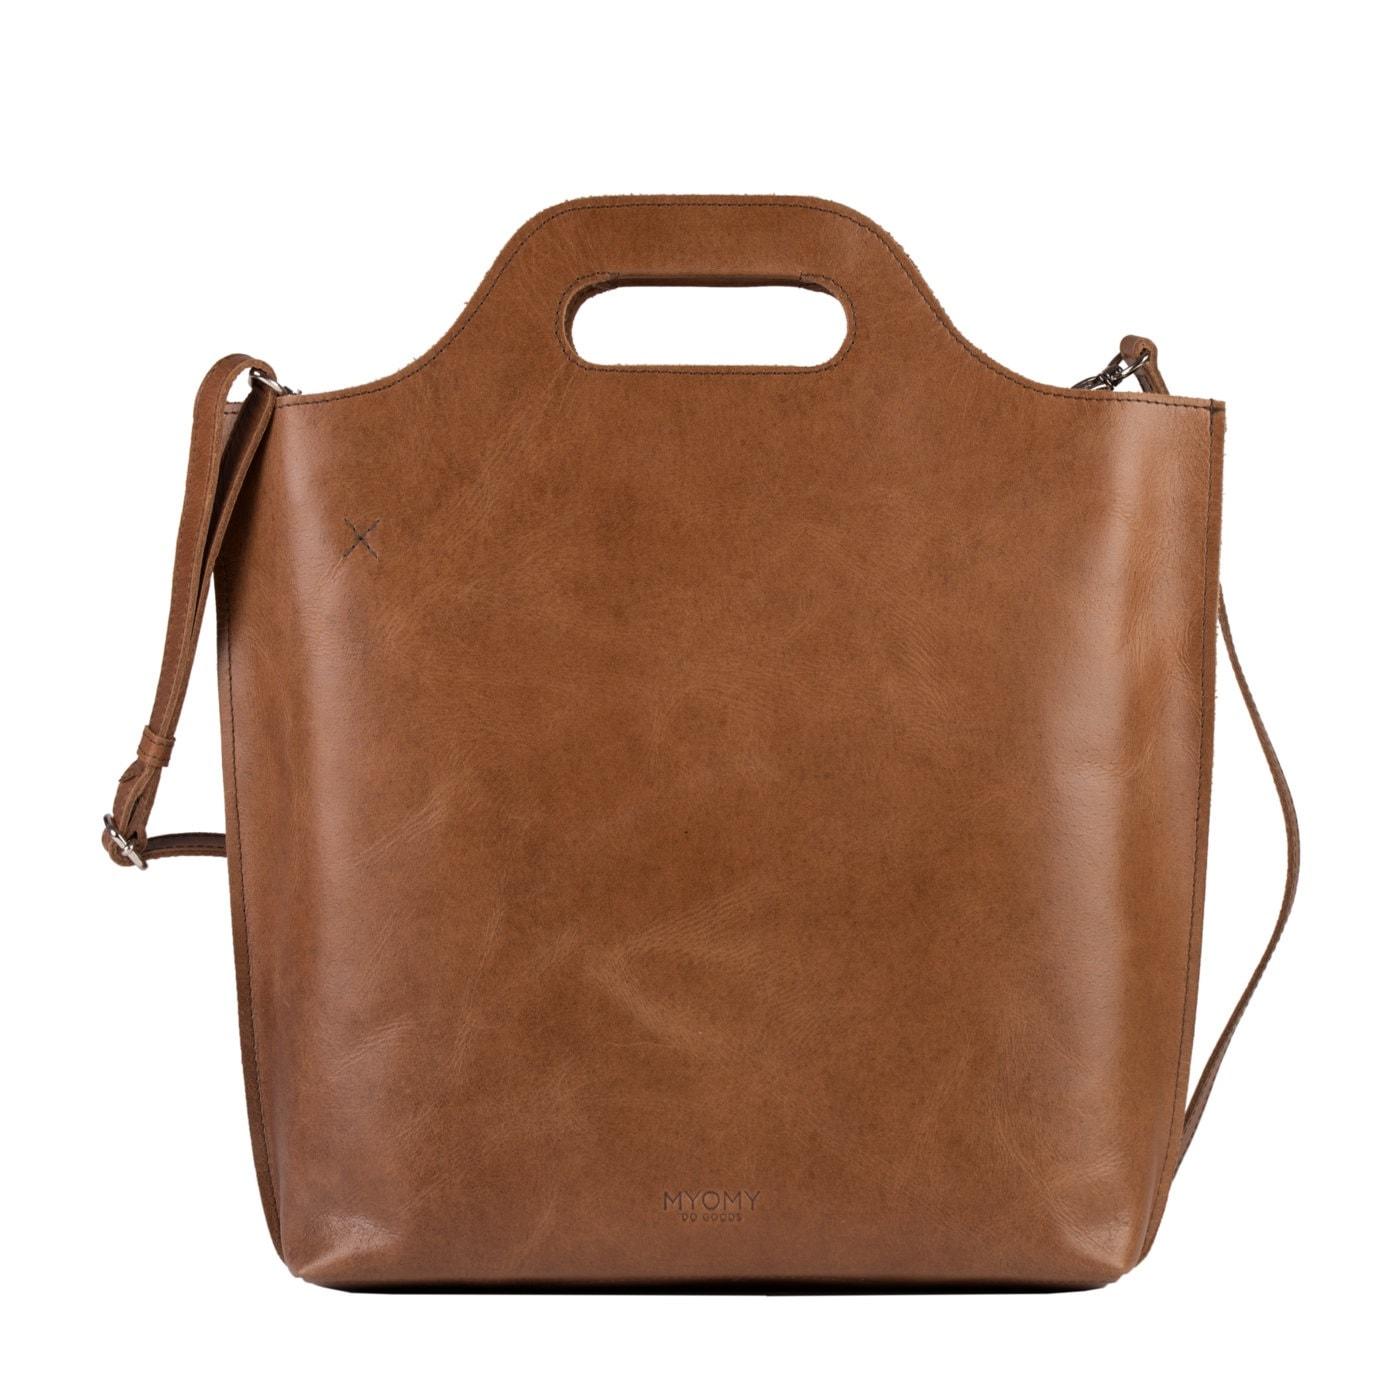 MY CARRY BAG shopper medium- hunter waxy cognac